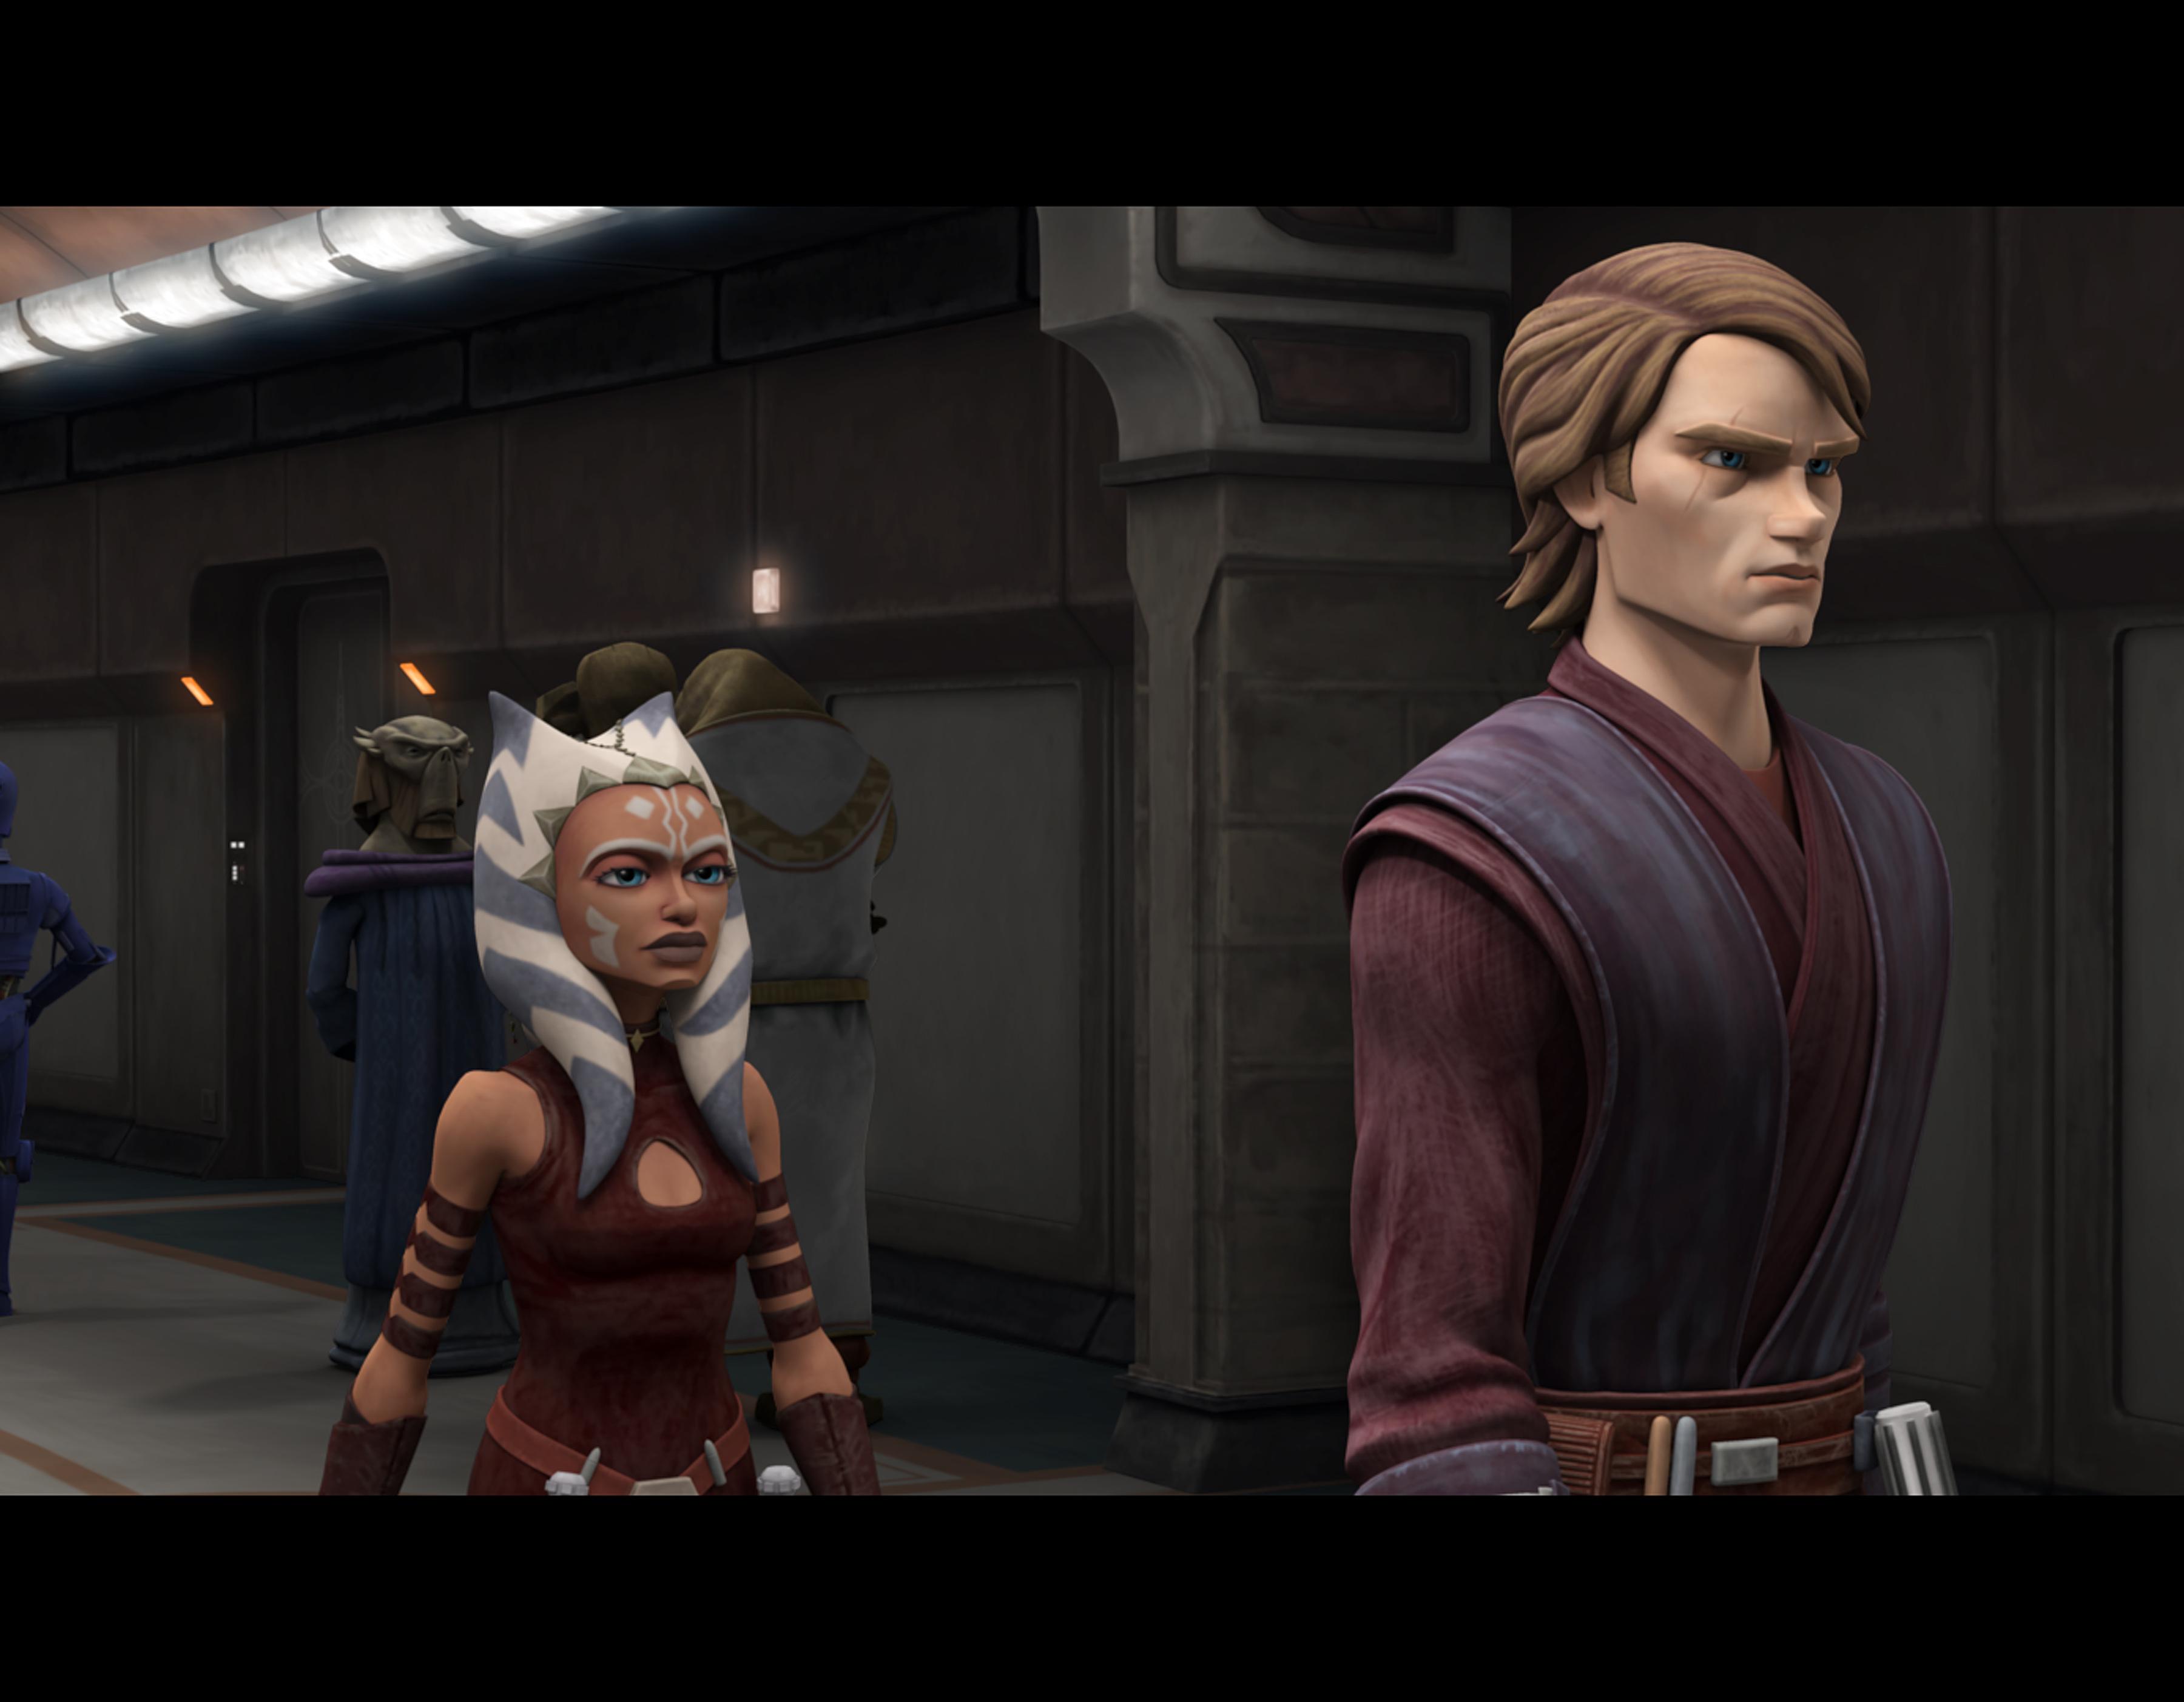 A new look for Anakin and Ahsoka